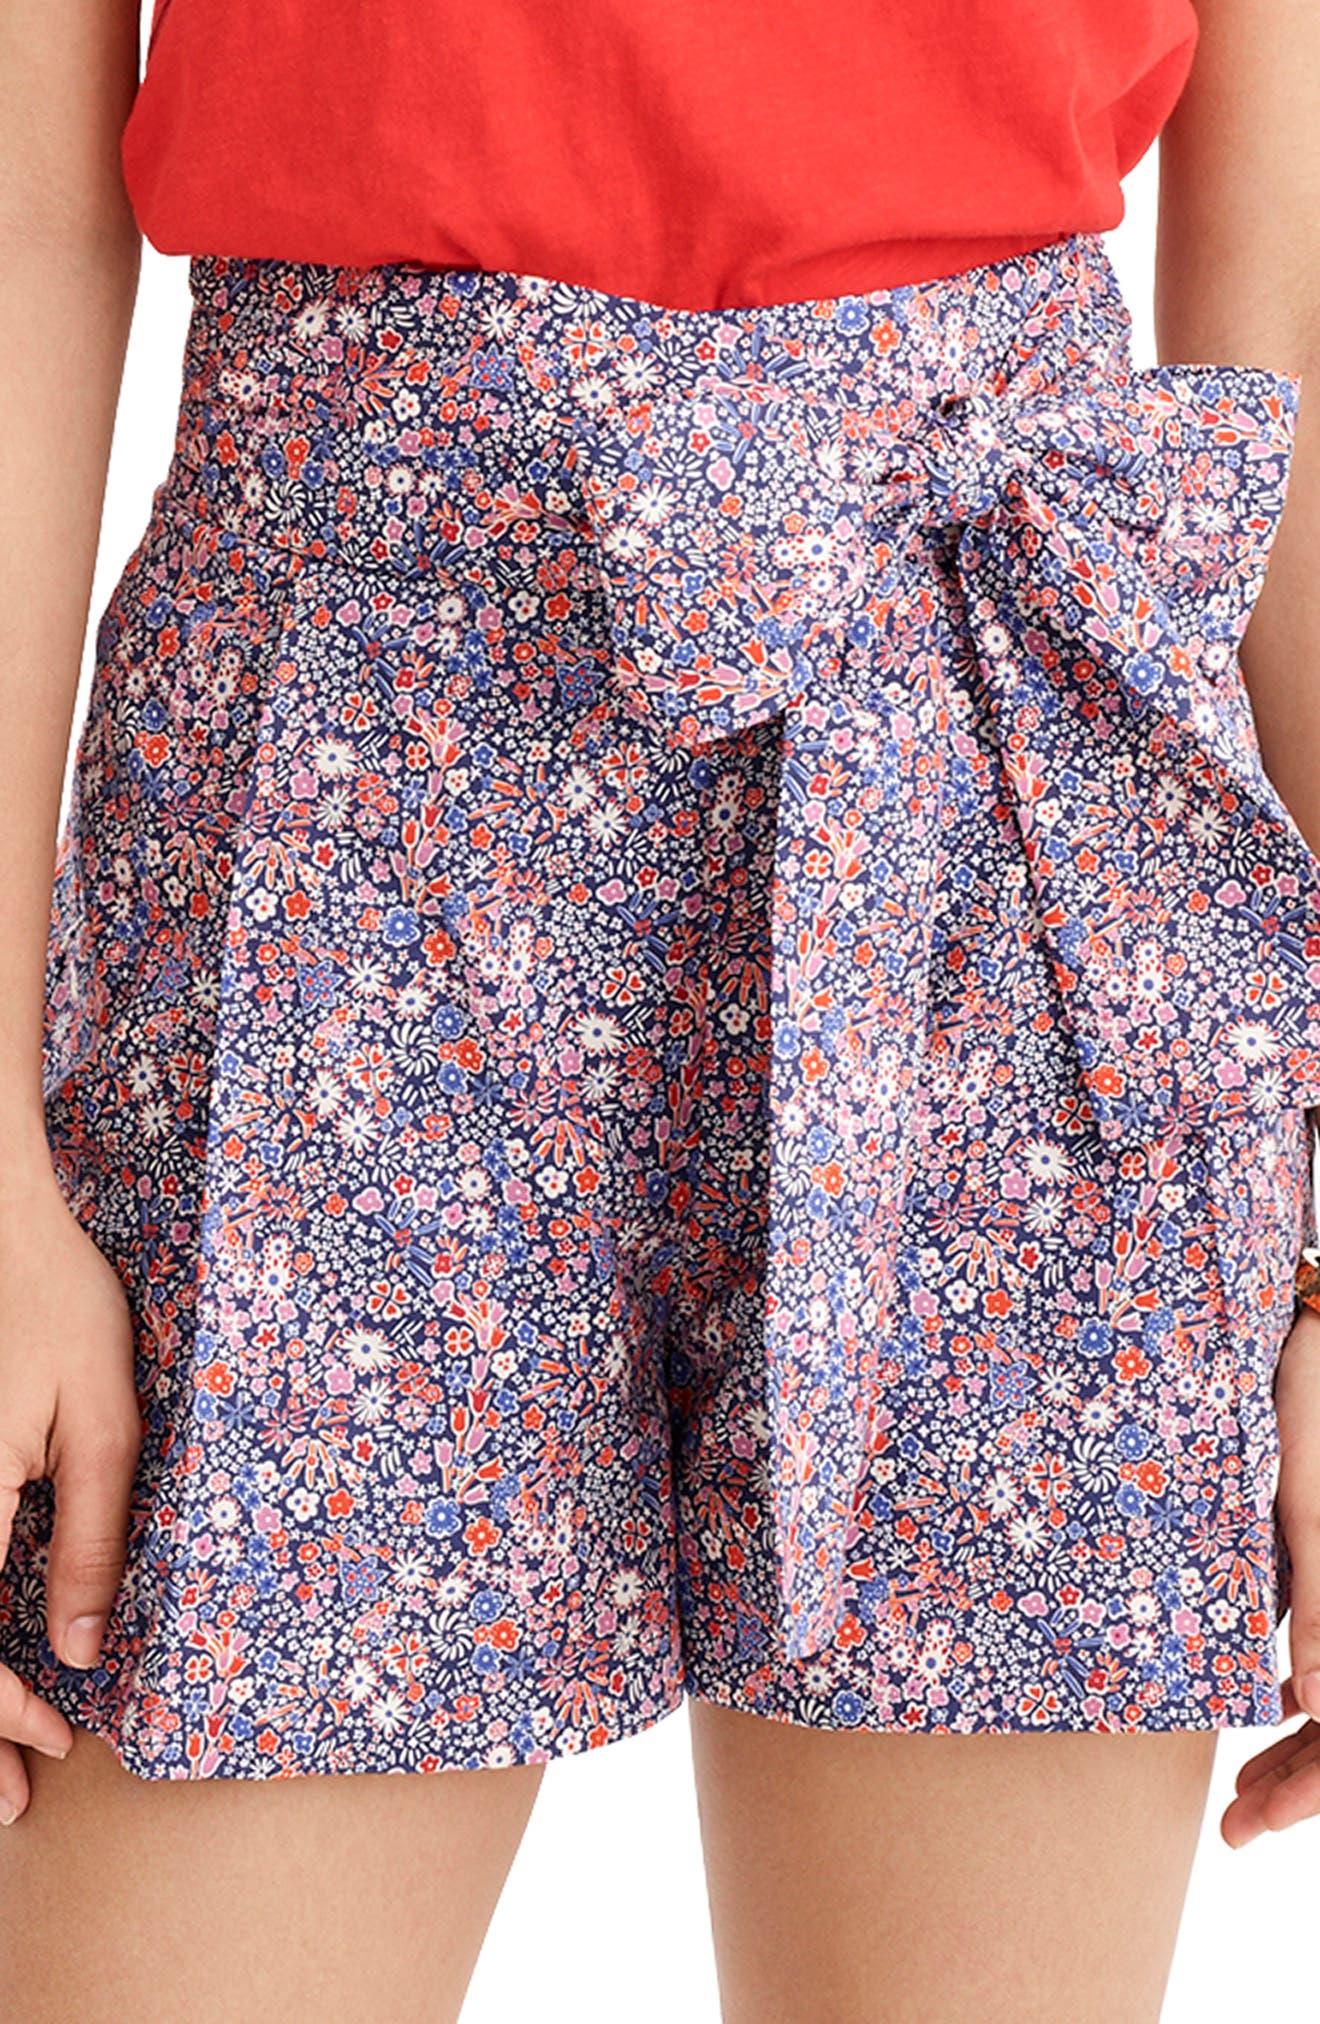 Liberty<sup>®</sup> Tana Lawn Tie Waist Shorts, Main, color, DEEP BLUE MULTI